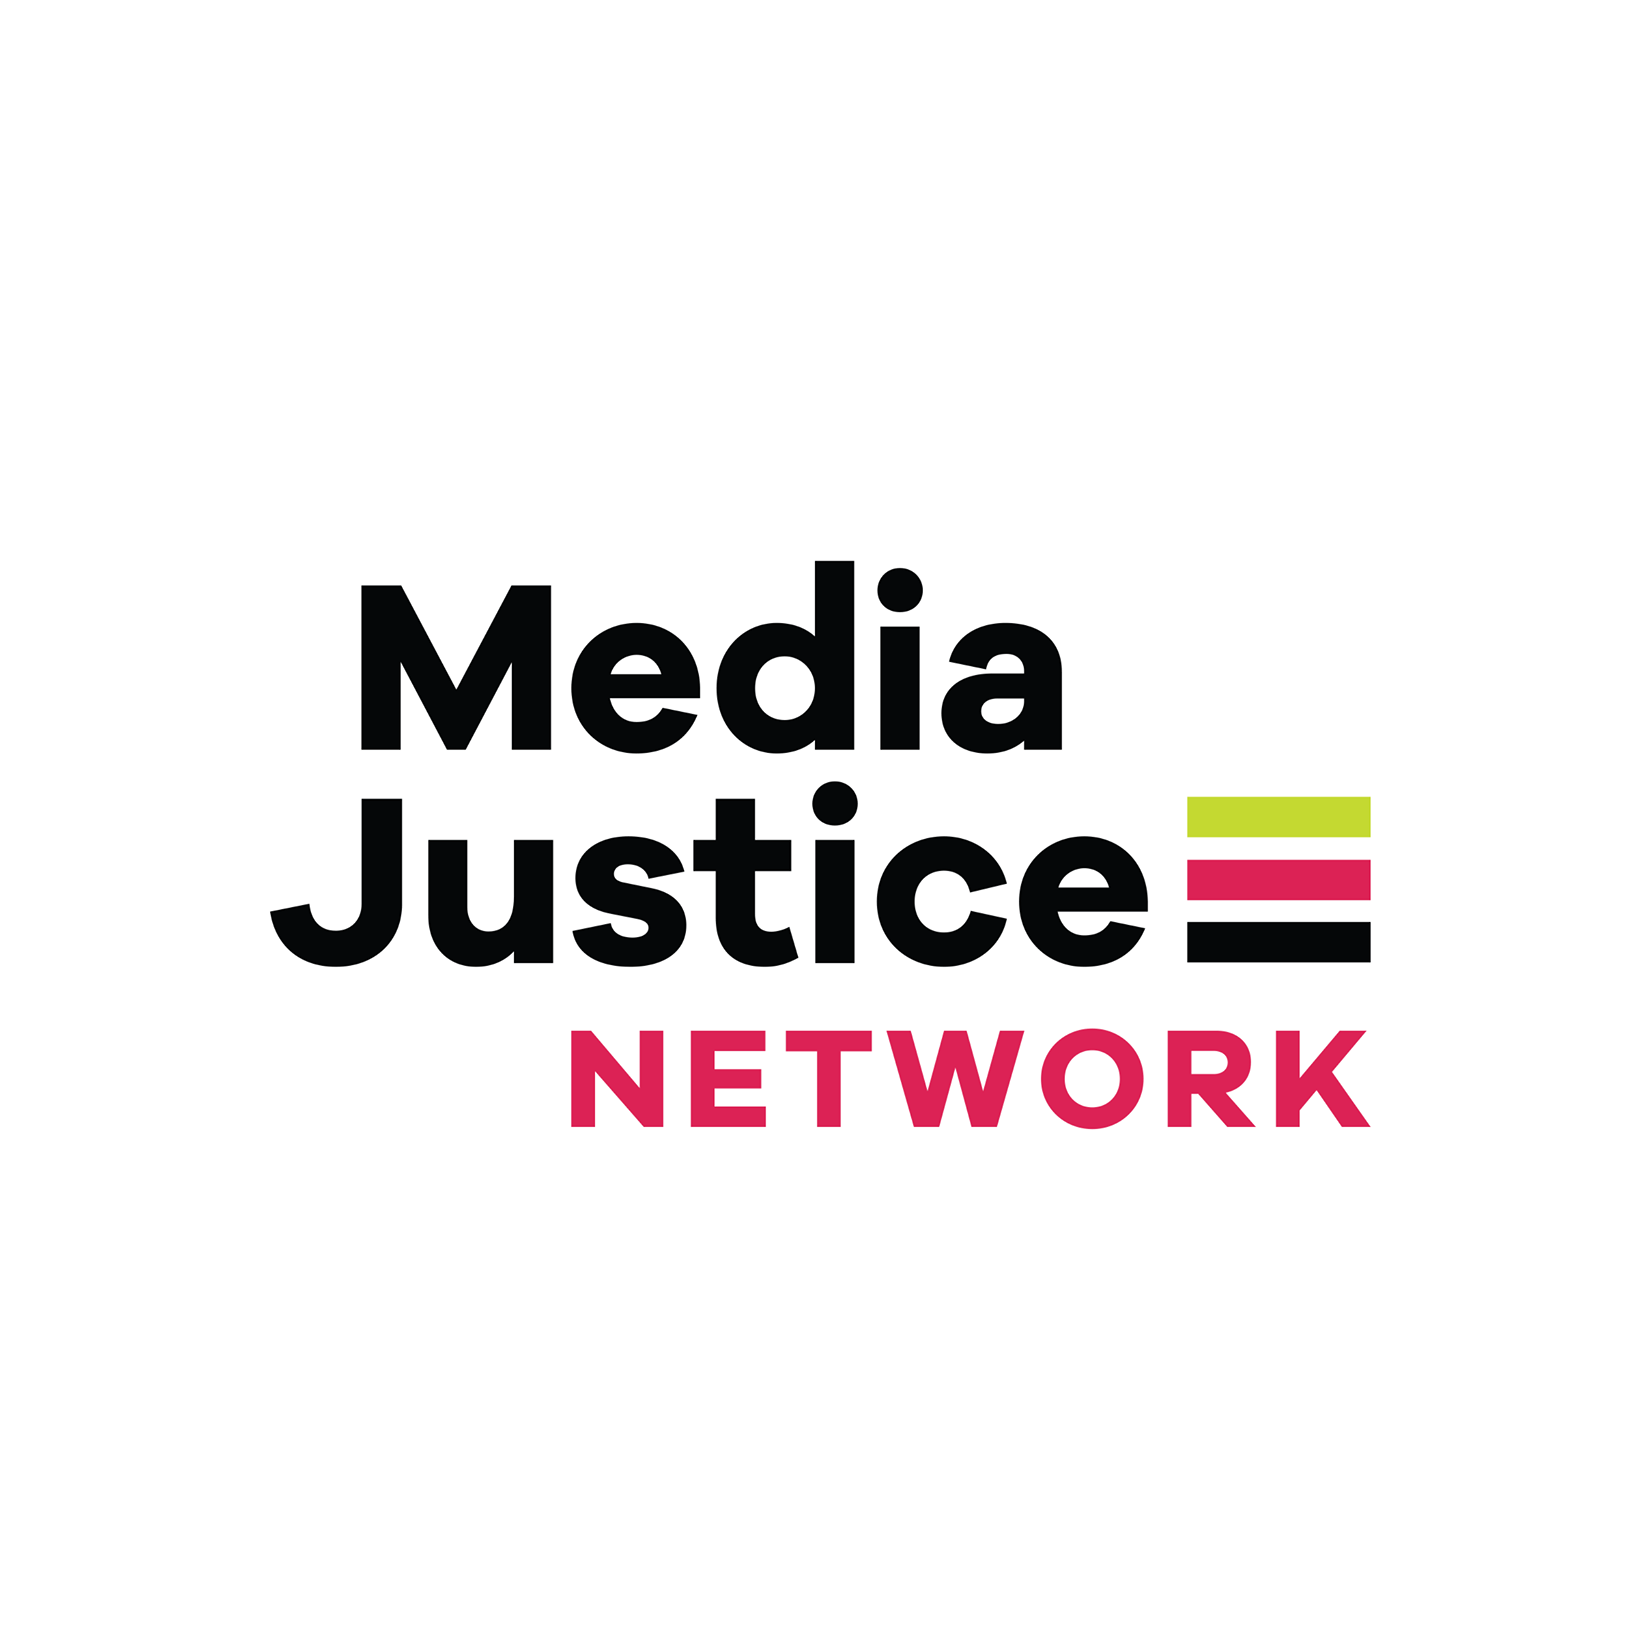 MediaJustice Network!'s logo